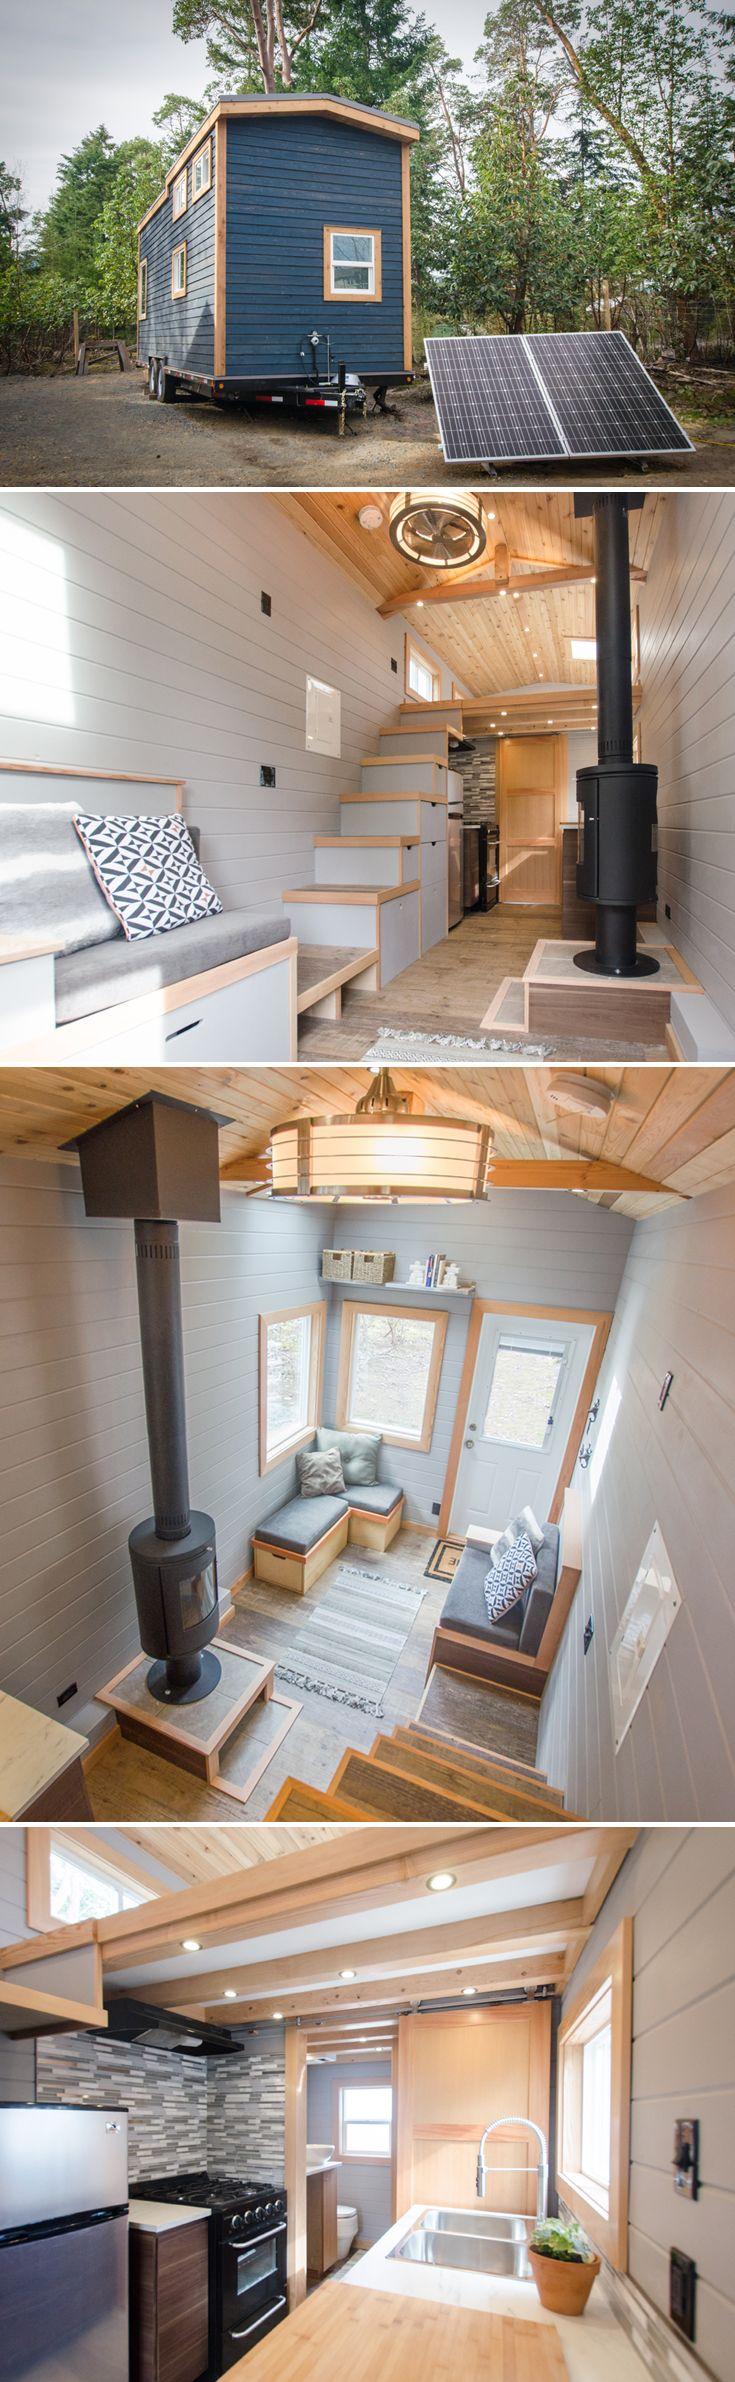 Best 25+ Off grid house ideas on Pinterest | Rustic modern cabin ...